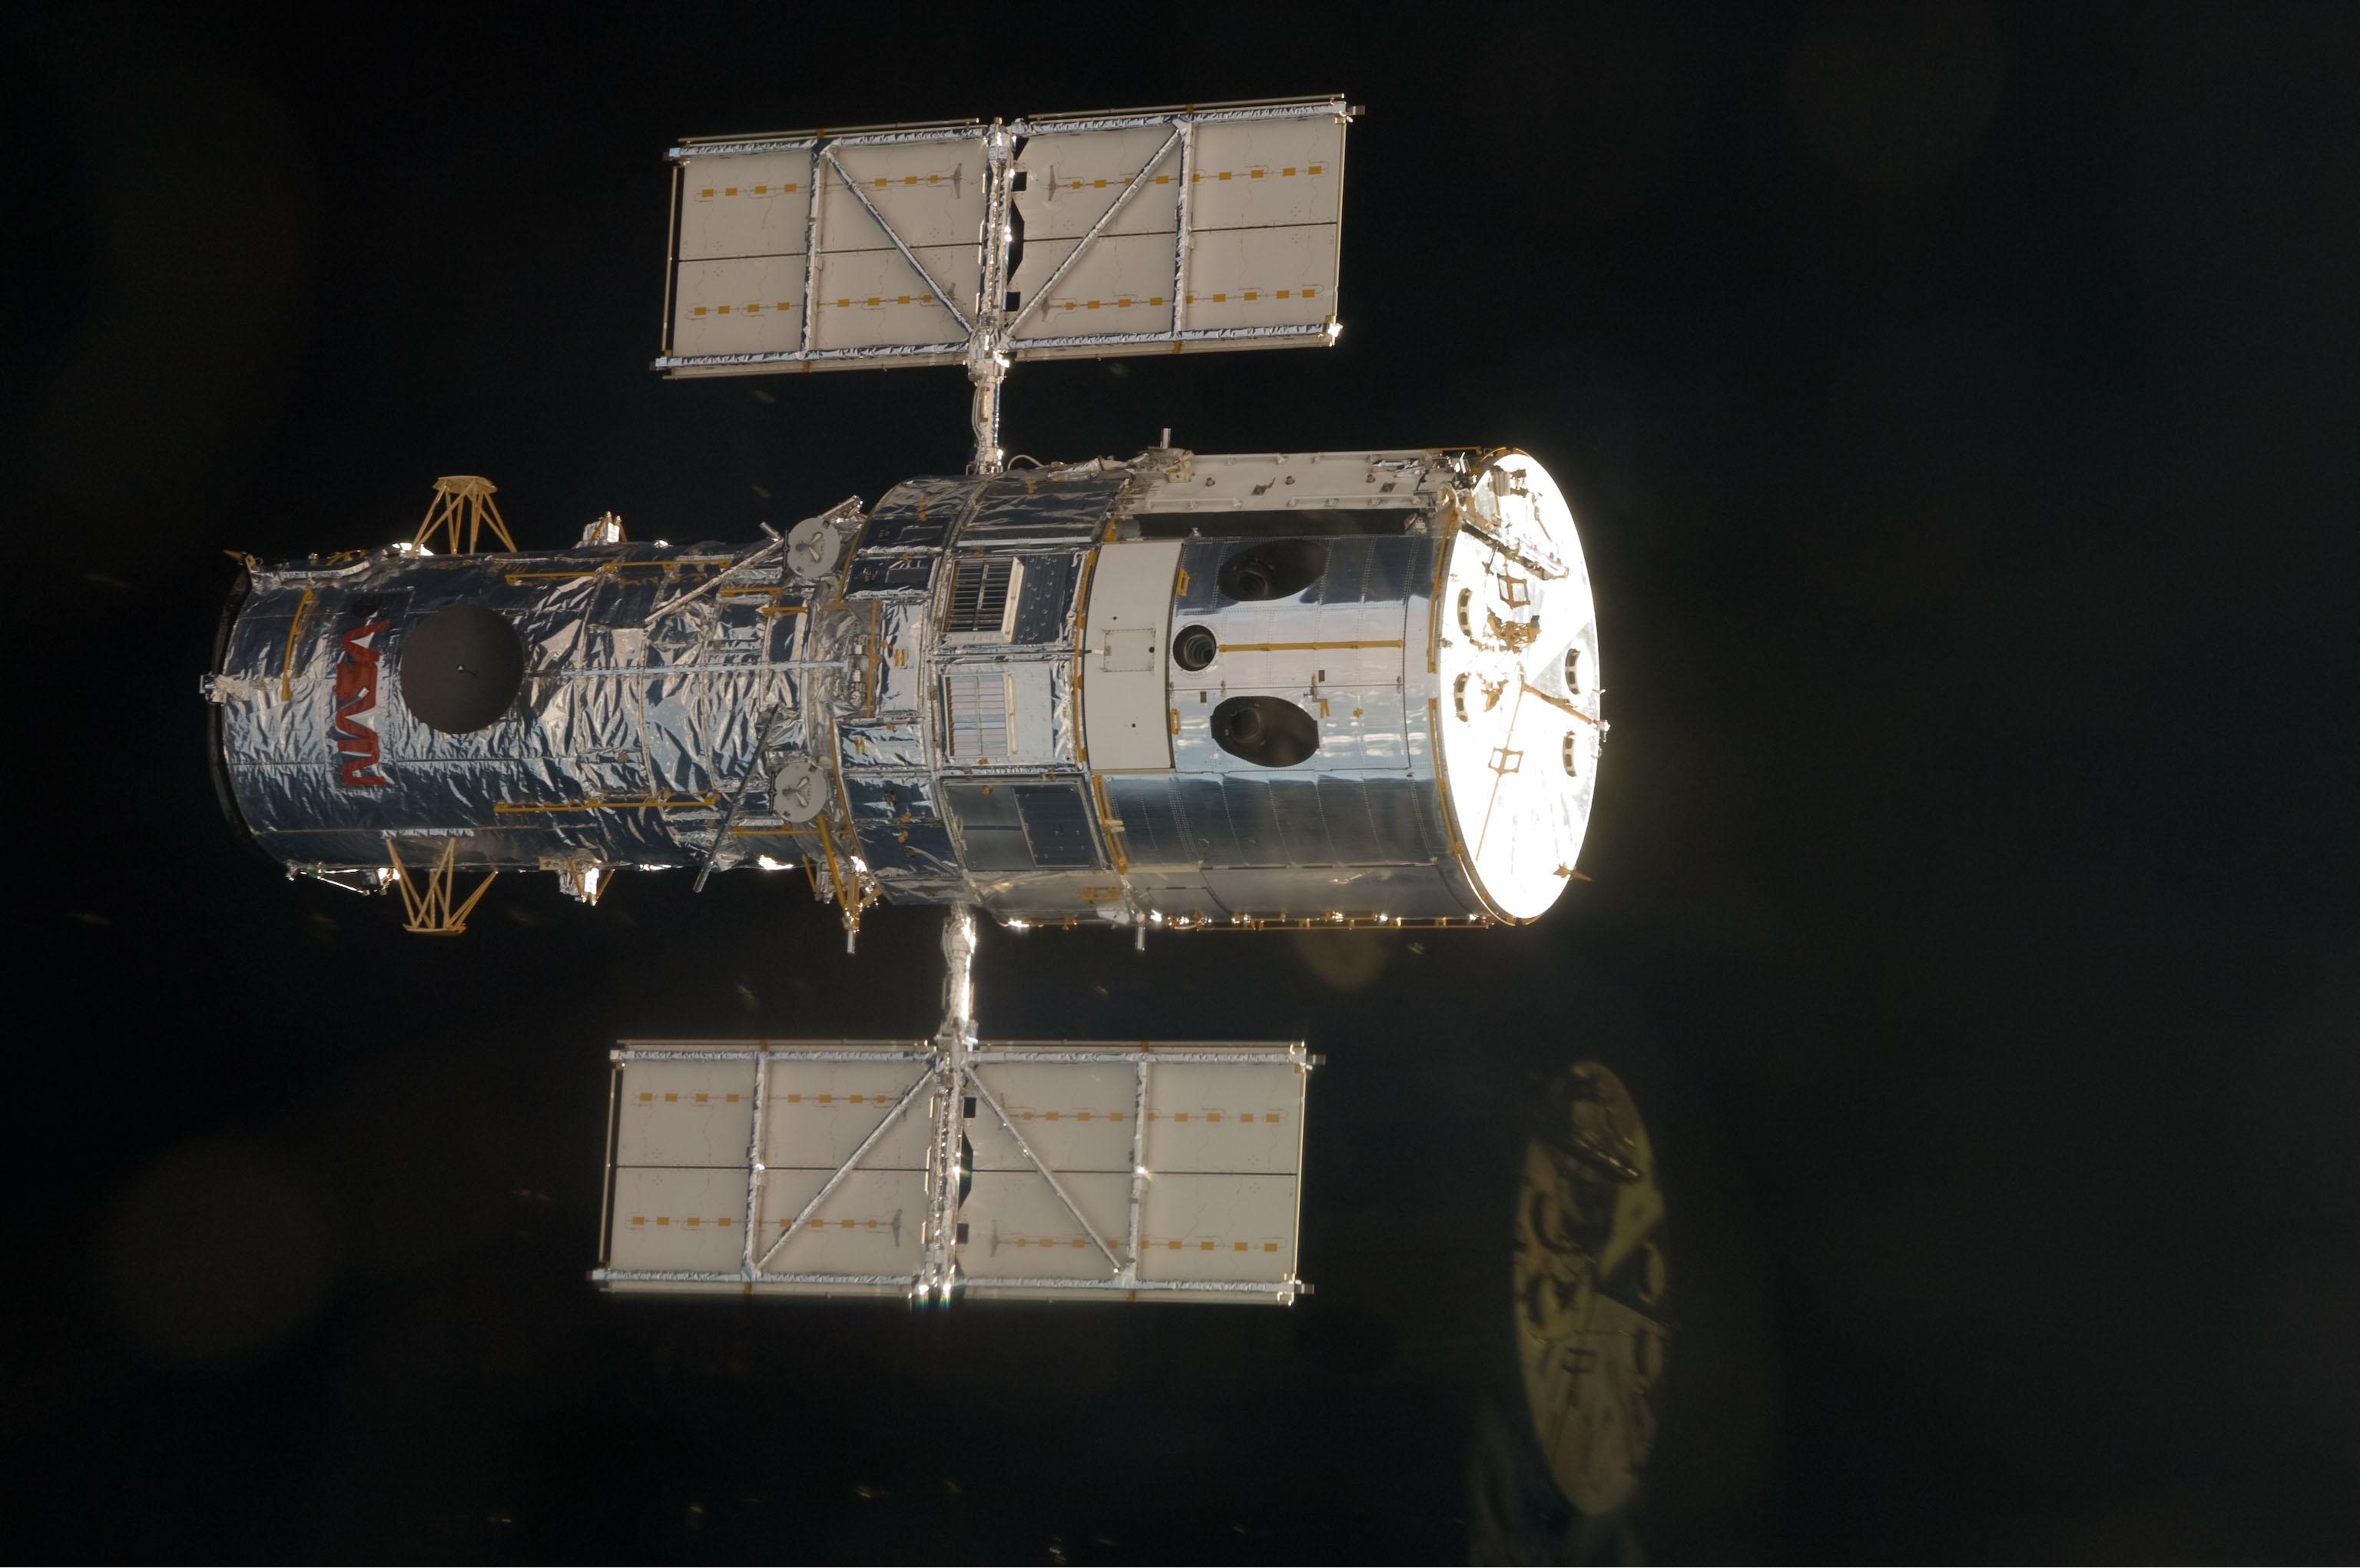 nasa building the hubble space telescope - HD3072×2041